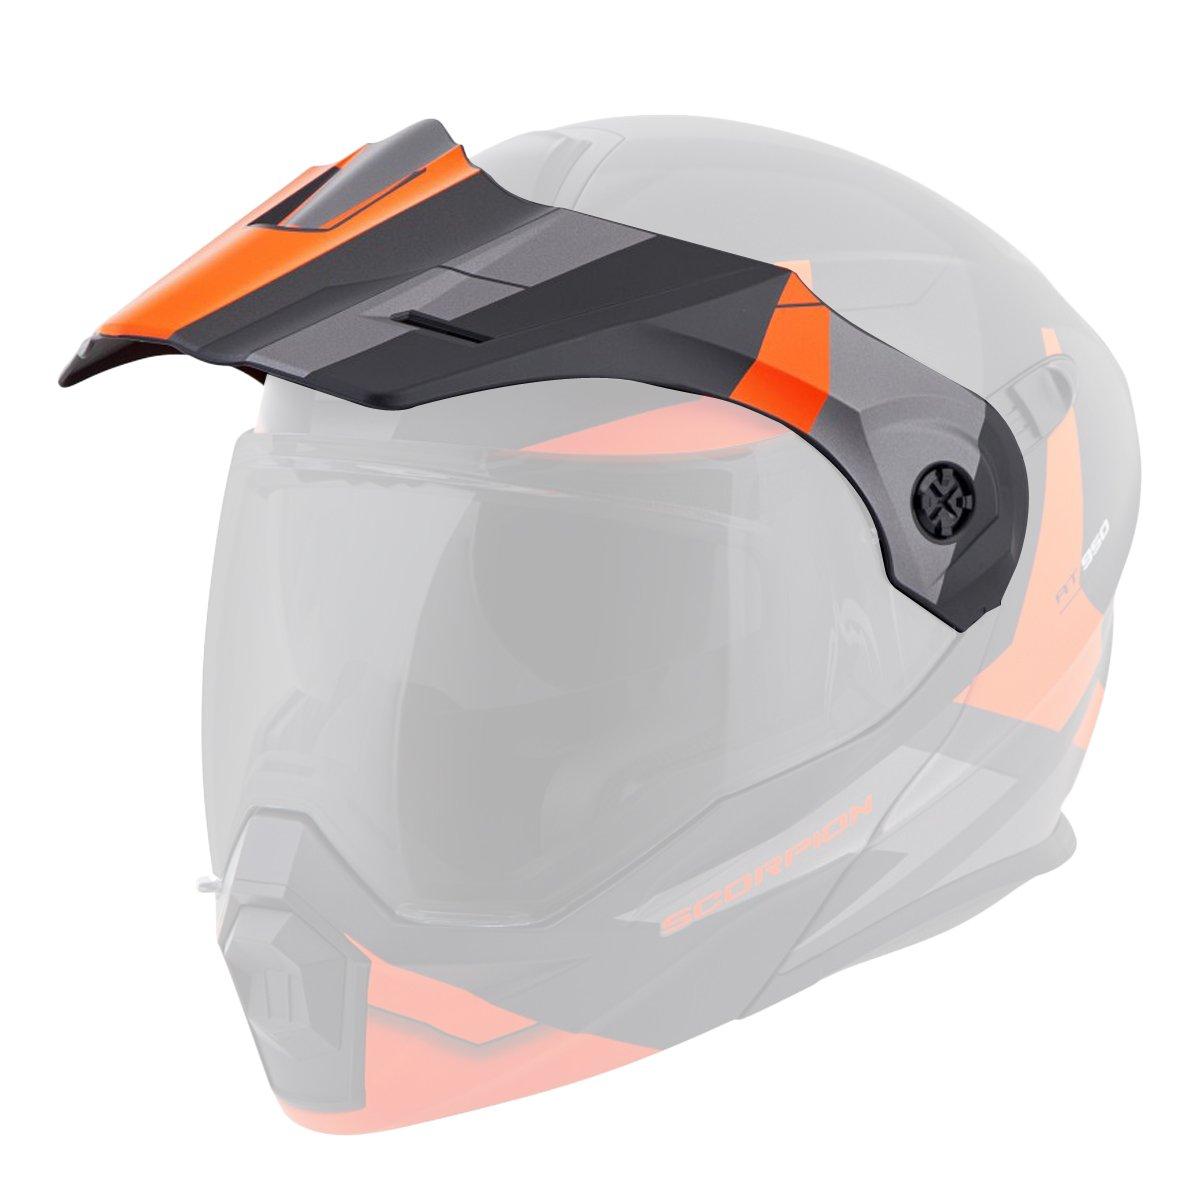 Orange//One Size Scorpion Peak Visor Exo-AT950 Motorcycle Helmet Accessories